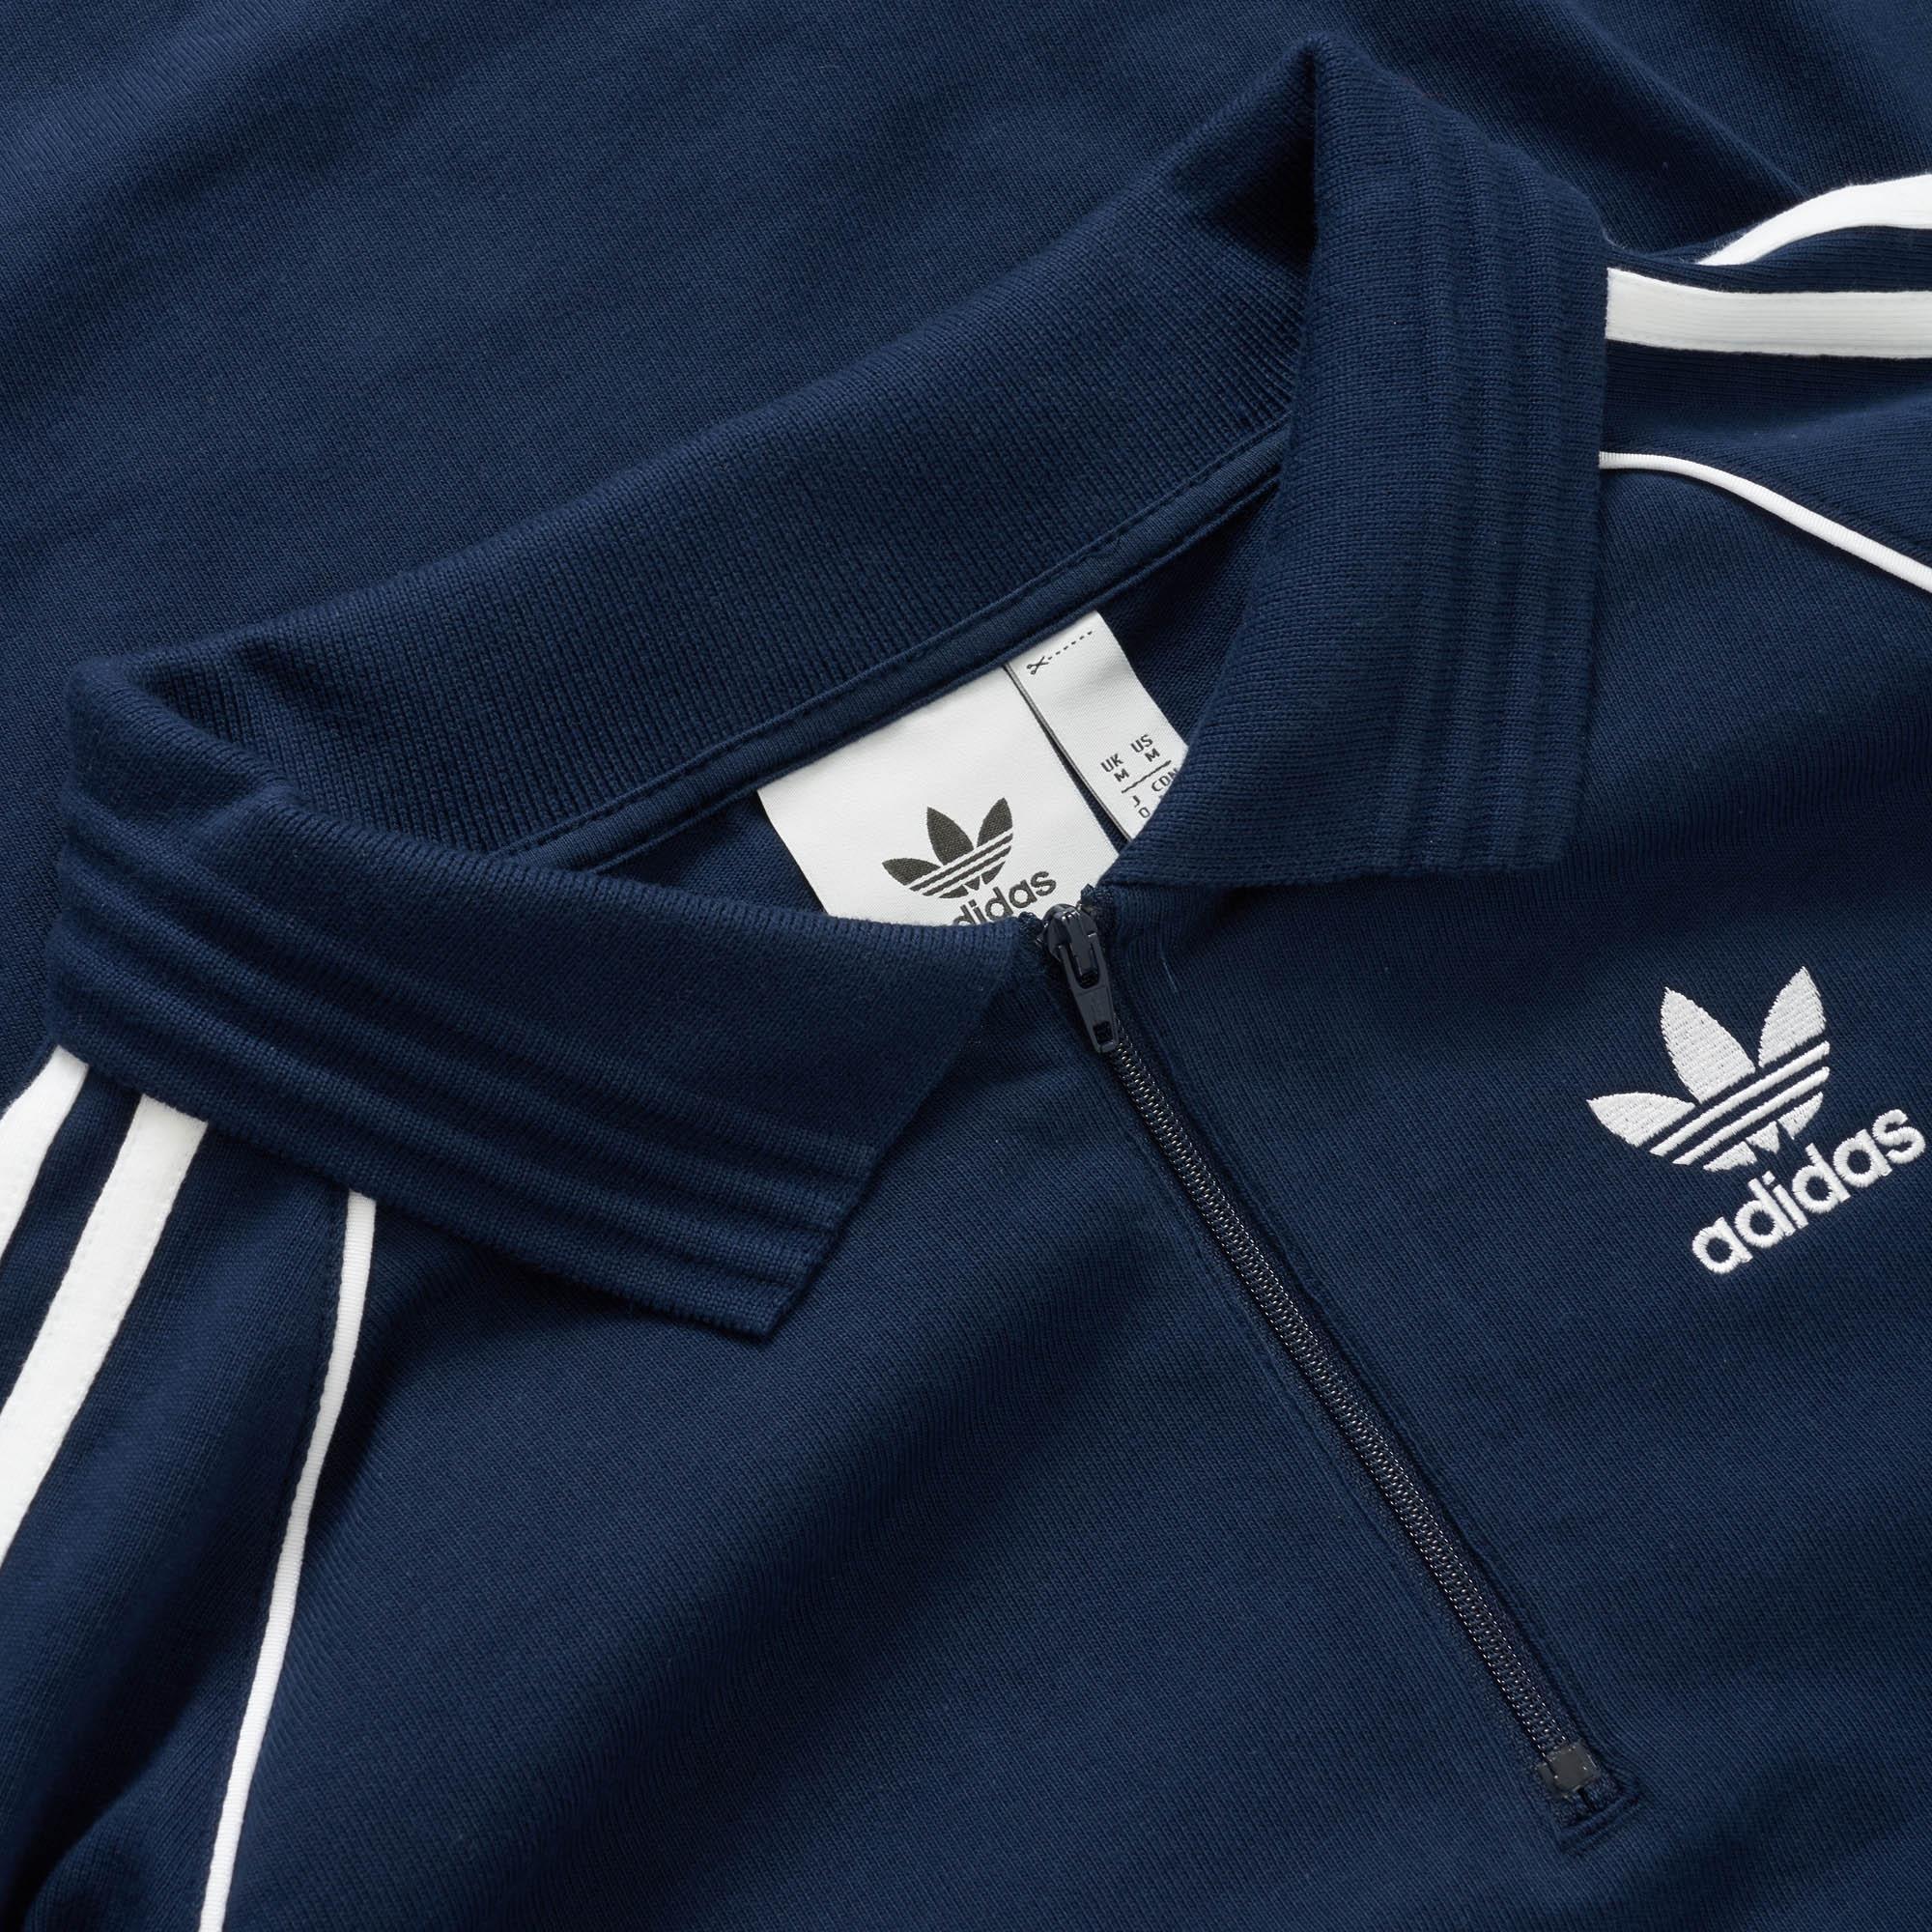 separation shoes ba82f 8de2d adidas Originals Authentic Rugby Jersey in Blue for Men - Lyst